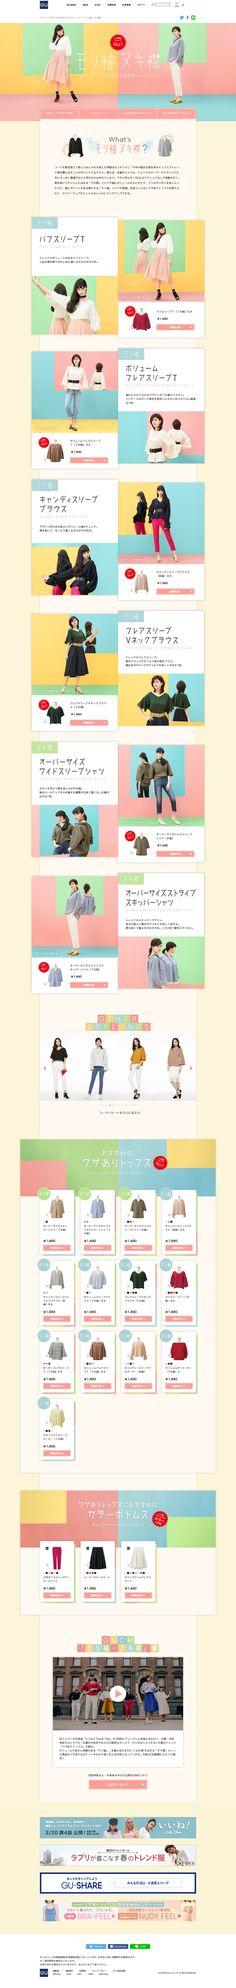 Fashion Web Design, Mobile Design, Banner Template, Interface Design, Cute Designs, Banner Design, Social Media Marketing, Magazines